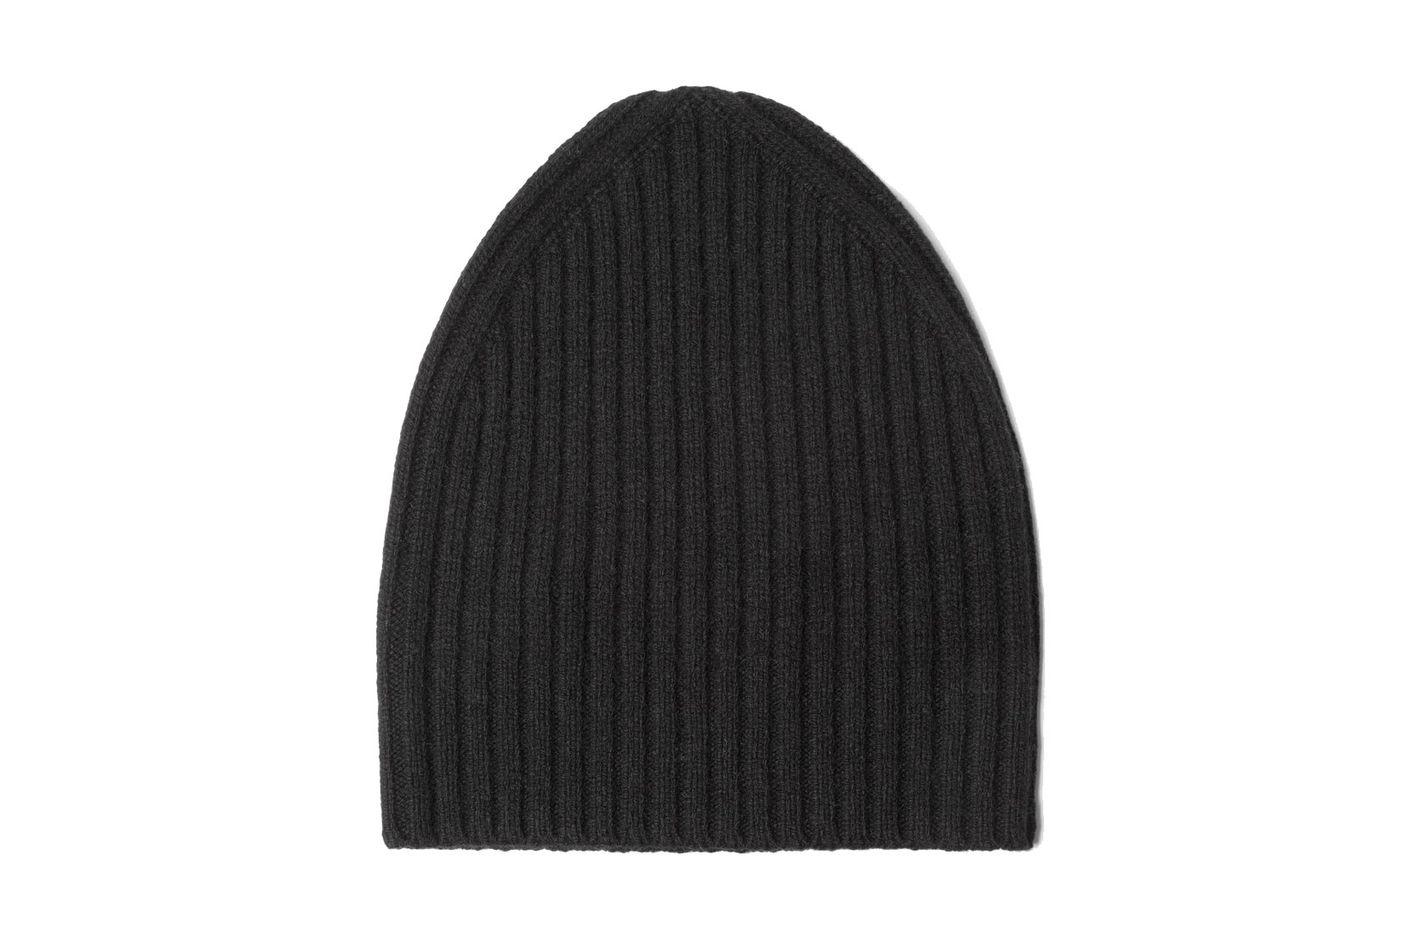 Everlane Wool Cashmere Beanie